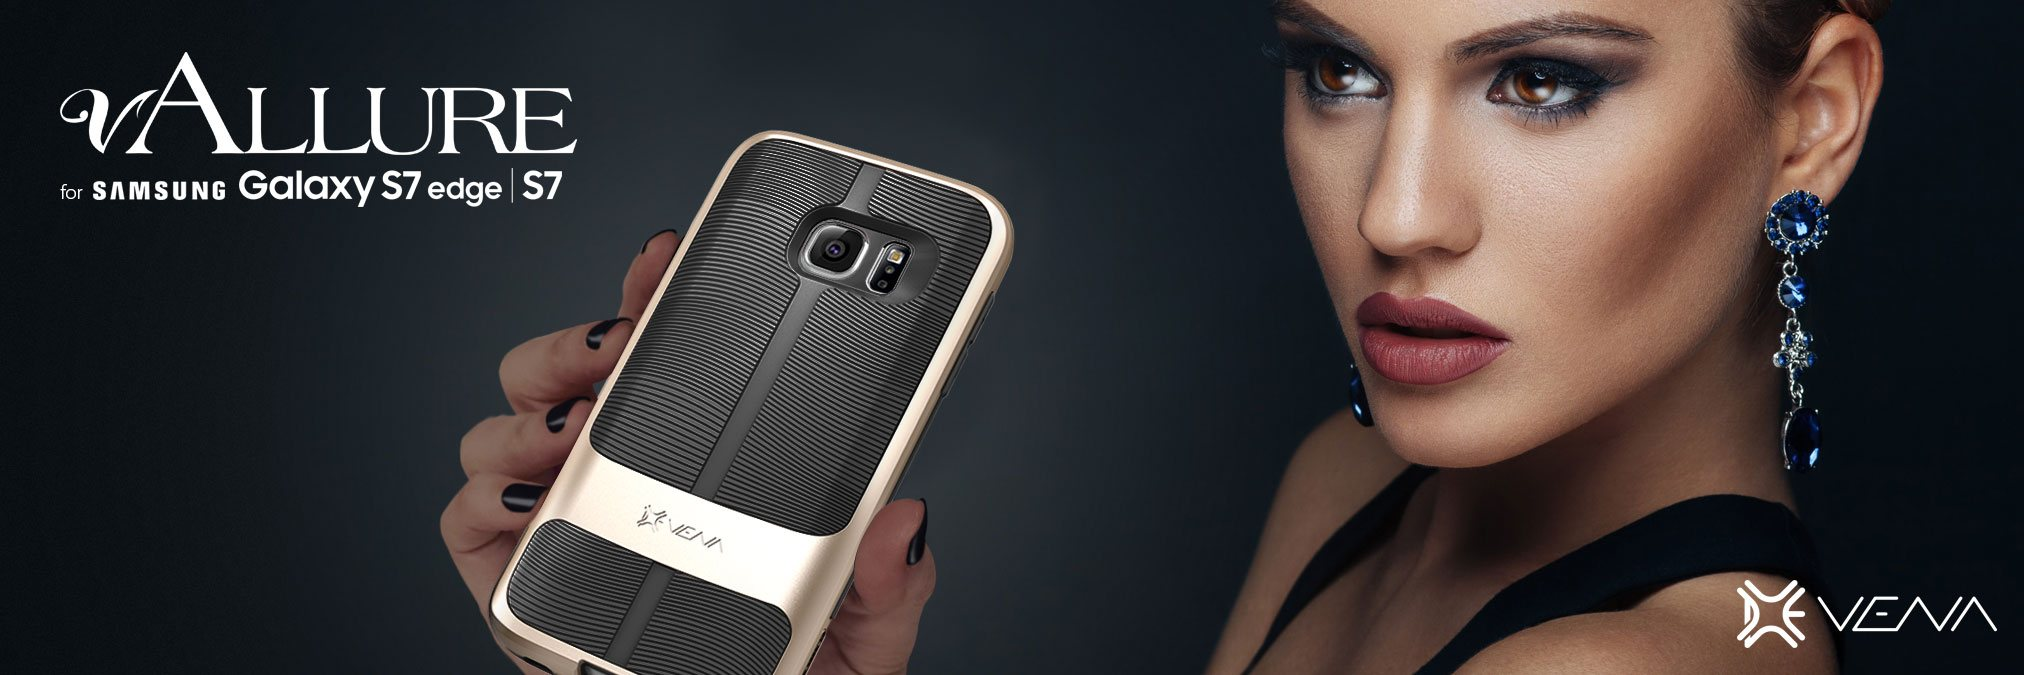 vAllure Galaxy S7 Edge